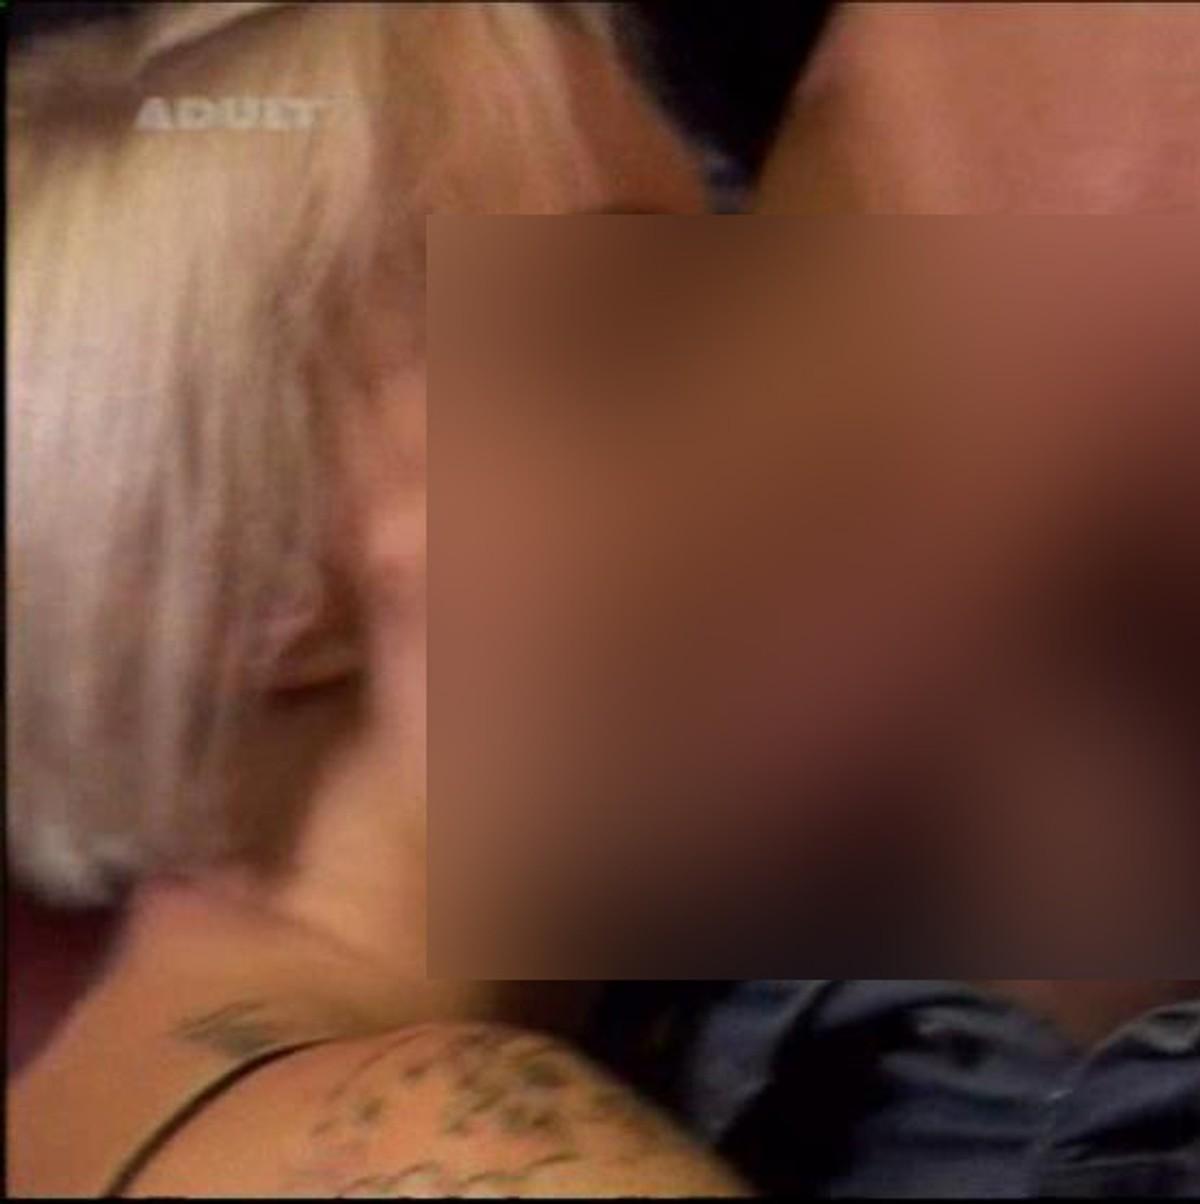 Digital canal erotiske kanaler Gratis kanaler